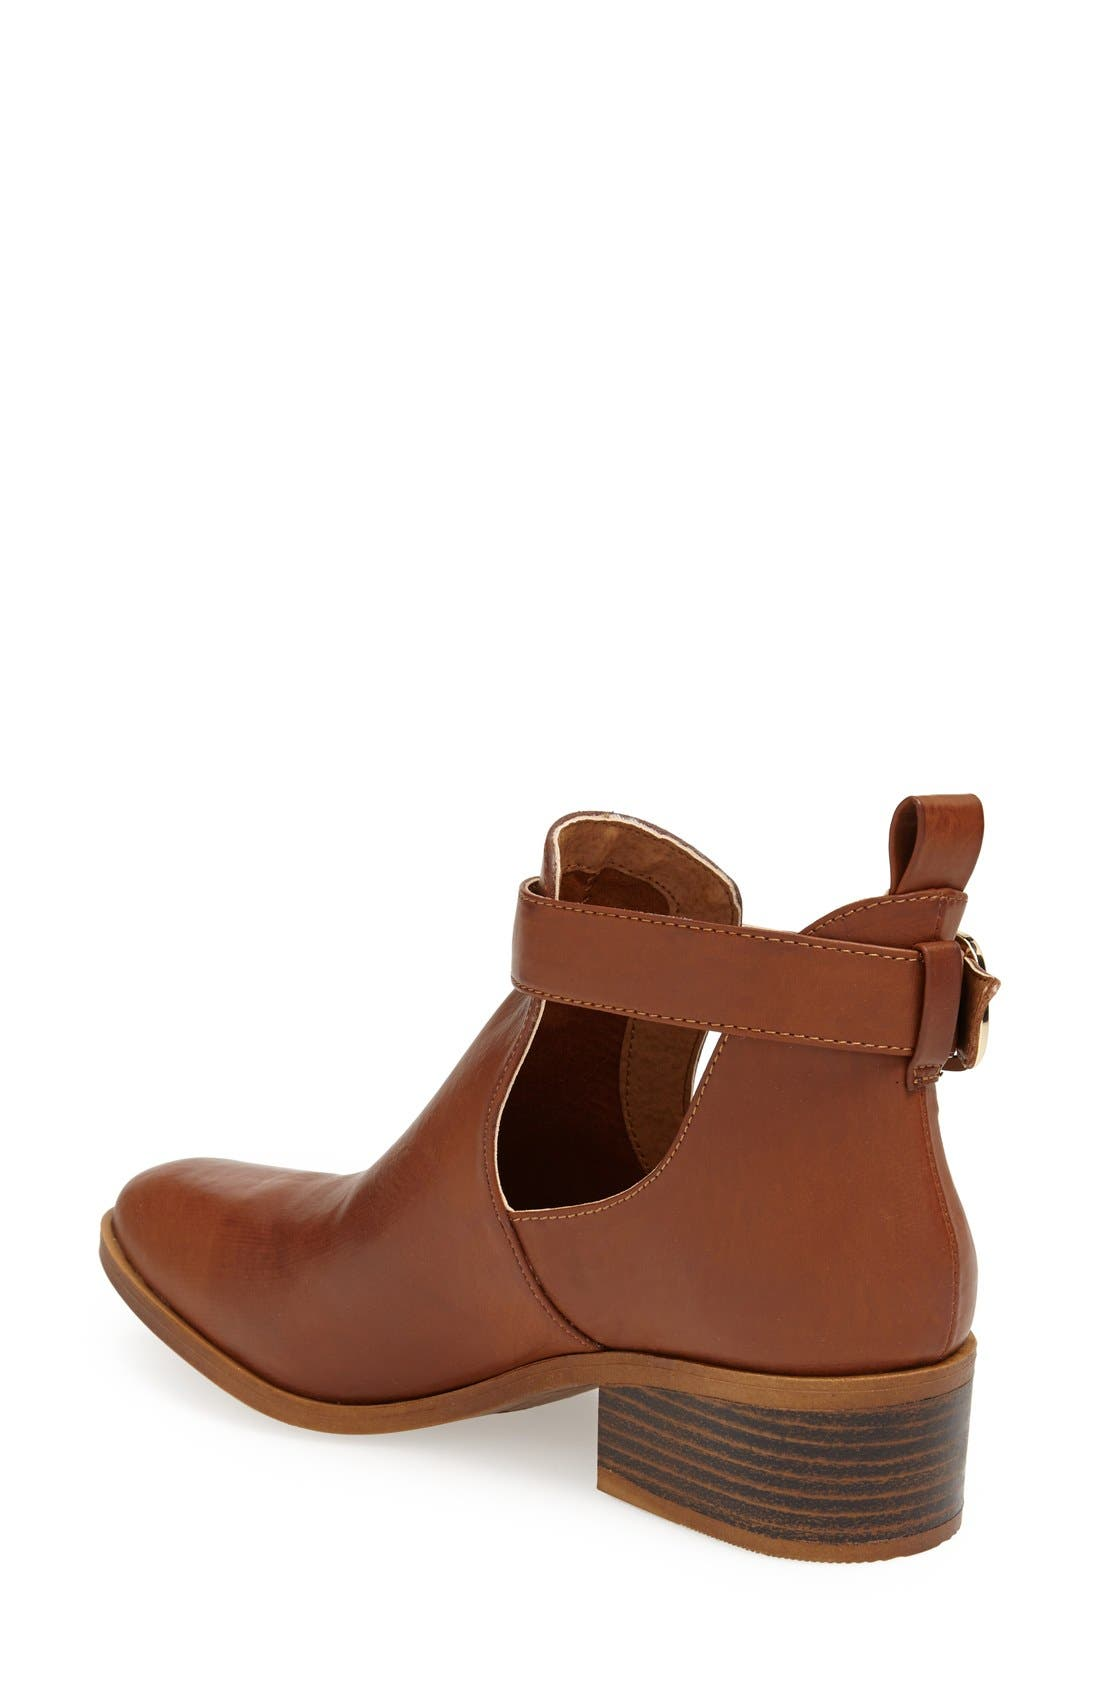 Alternate Image 2  - BC Footwear 'Dress Up' Ankle Bootie (Women)